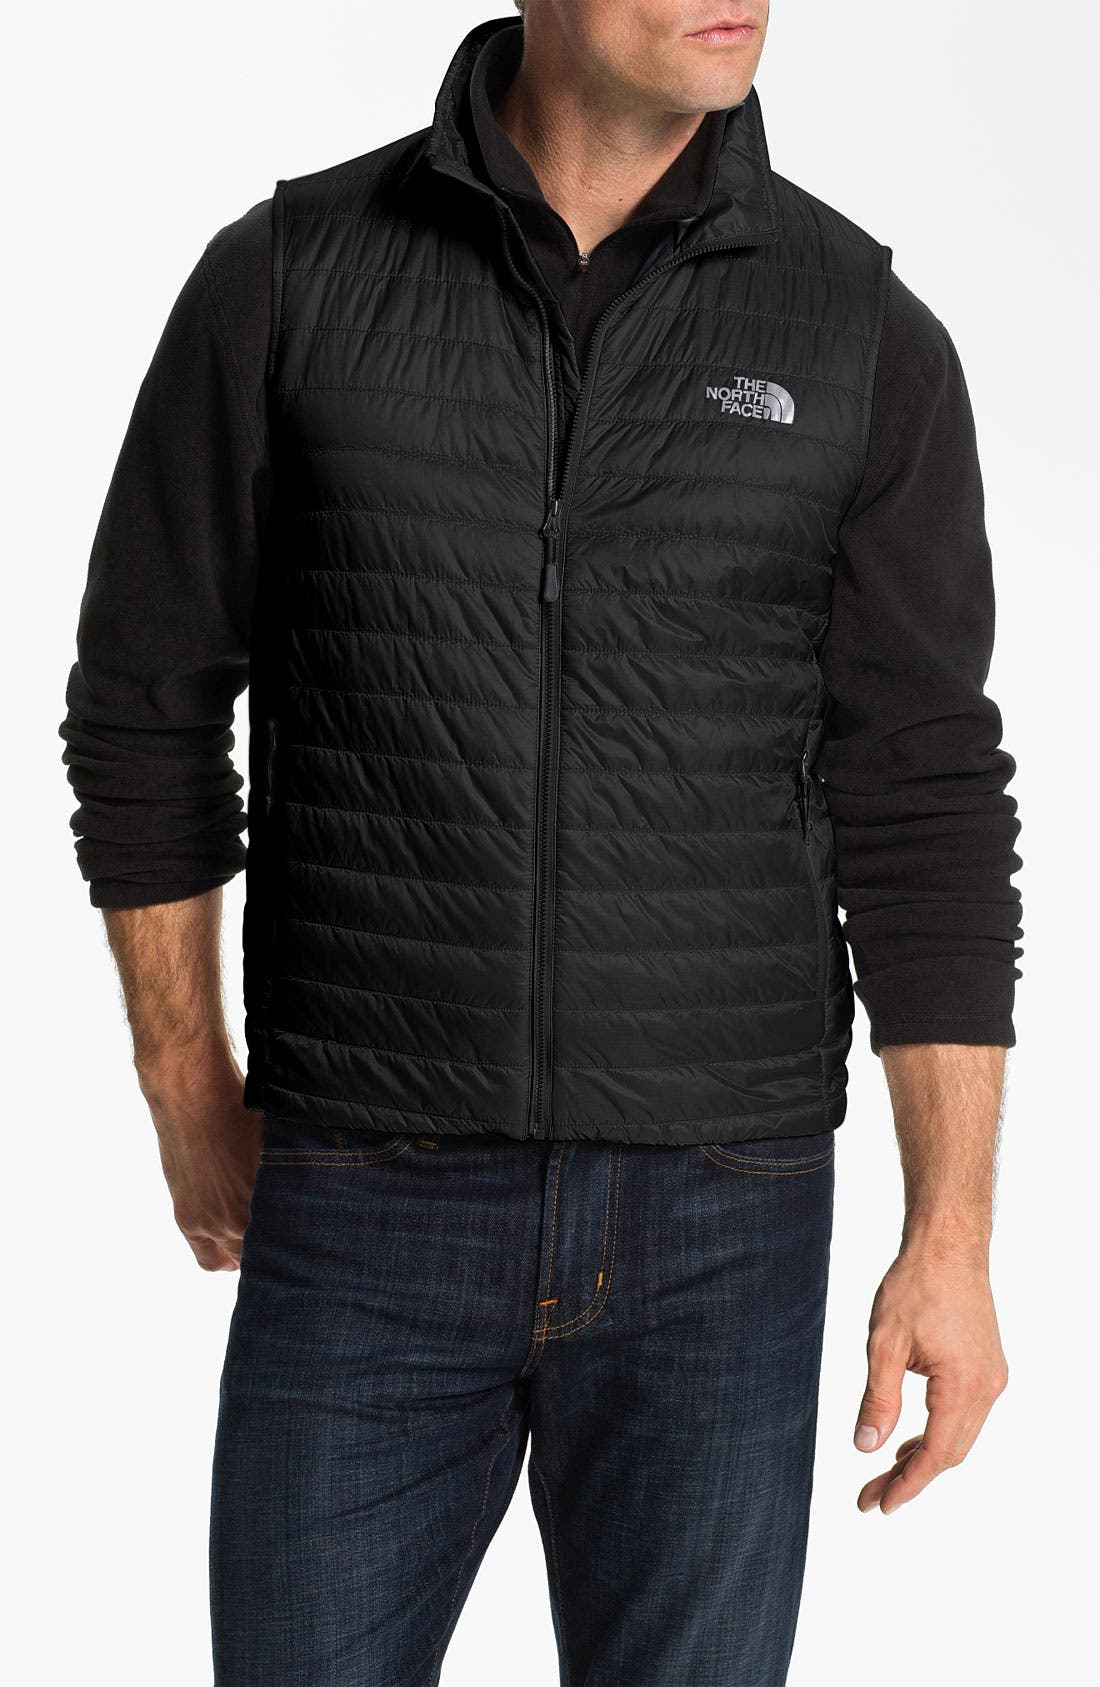 Main Image - The North Face 'Blaze' Vest